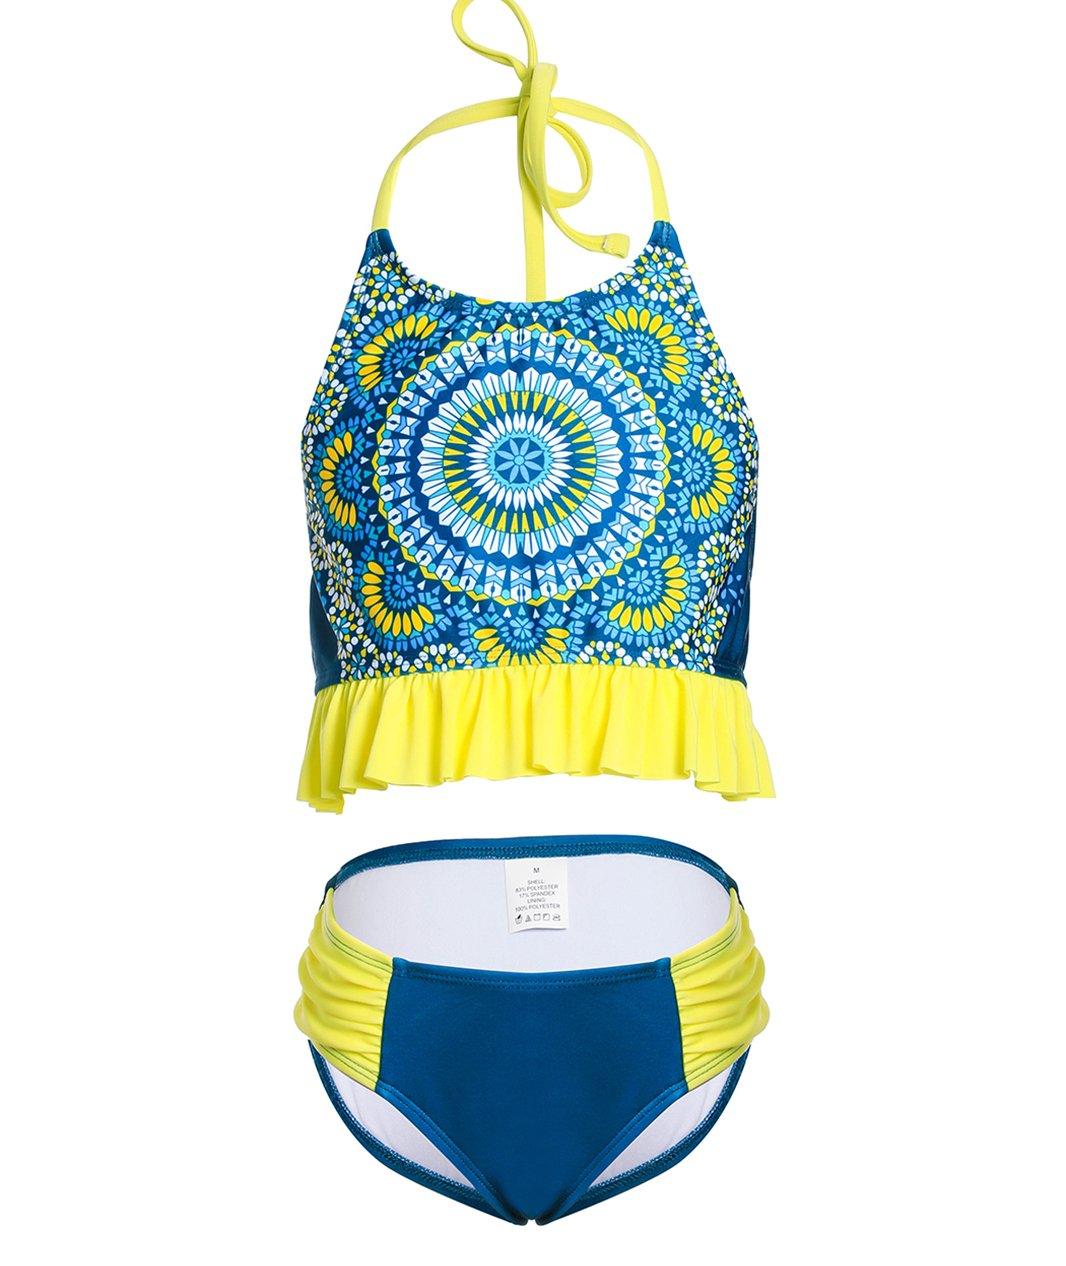 BELLOO Girl Ruffled Hem Bikini Bathing Suit Halter Two Piece Swimwear,(Large)10-12